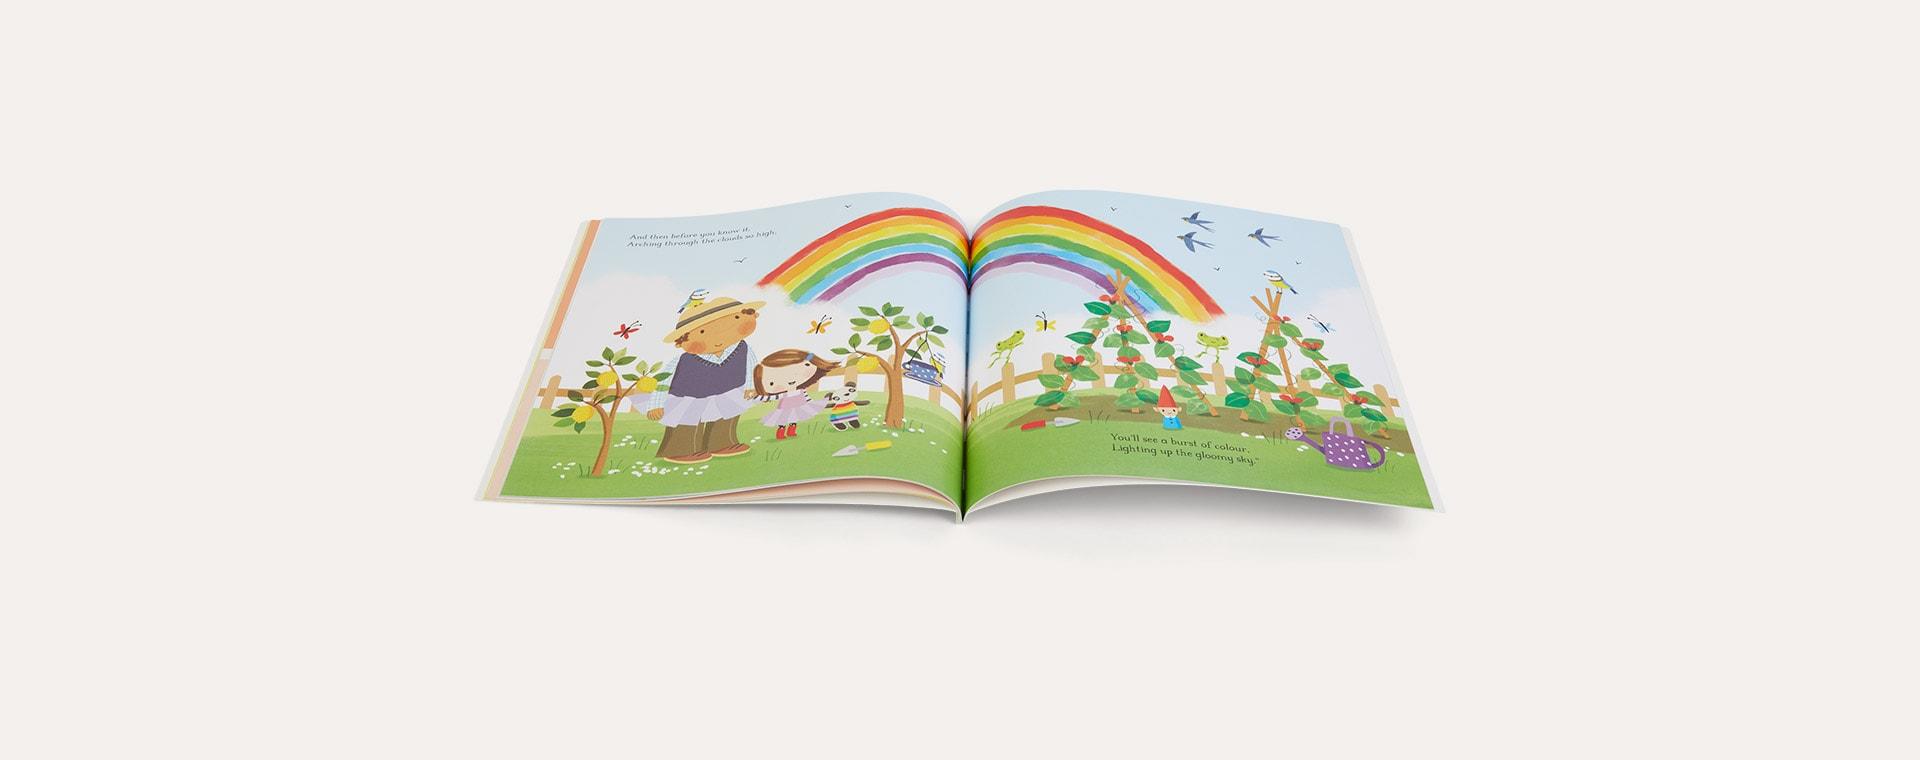 Multi bookspeed How Do You Make A Rainbow